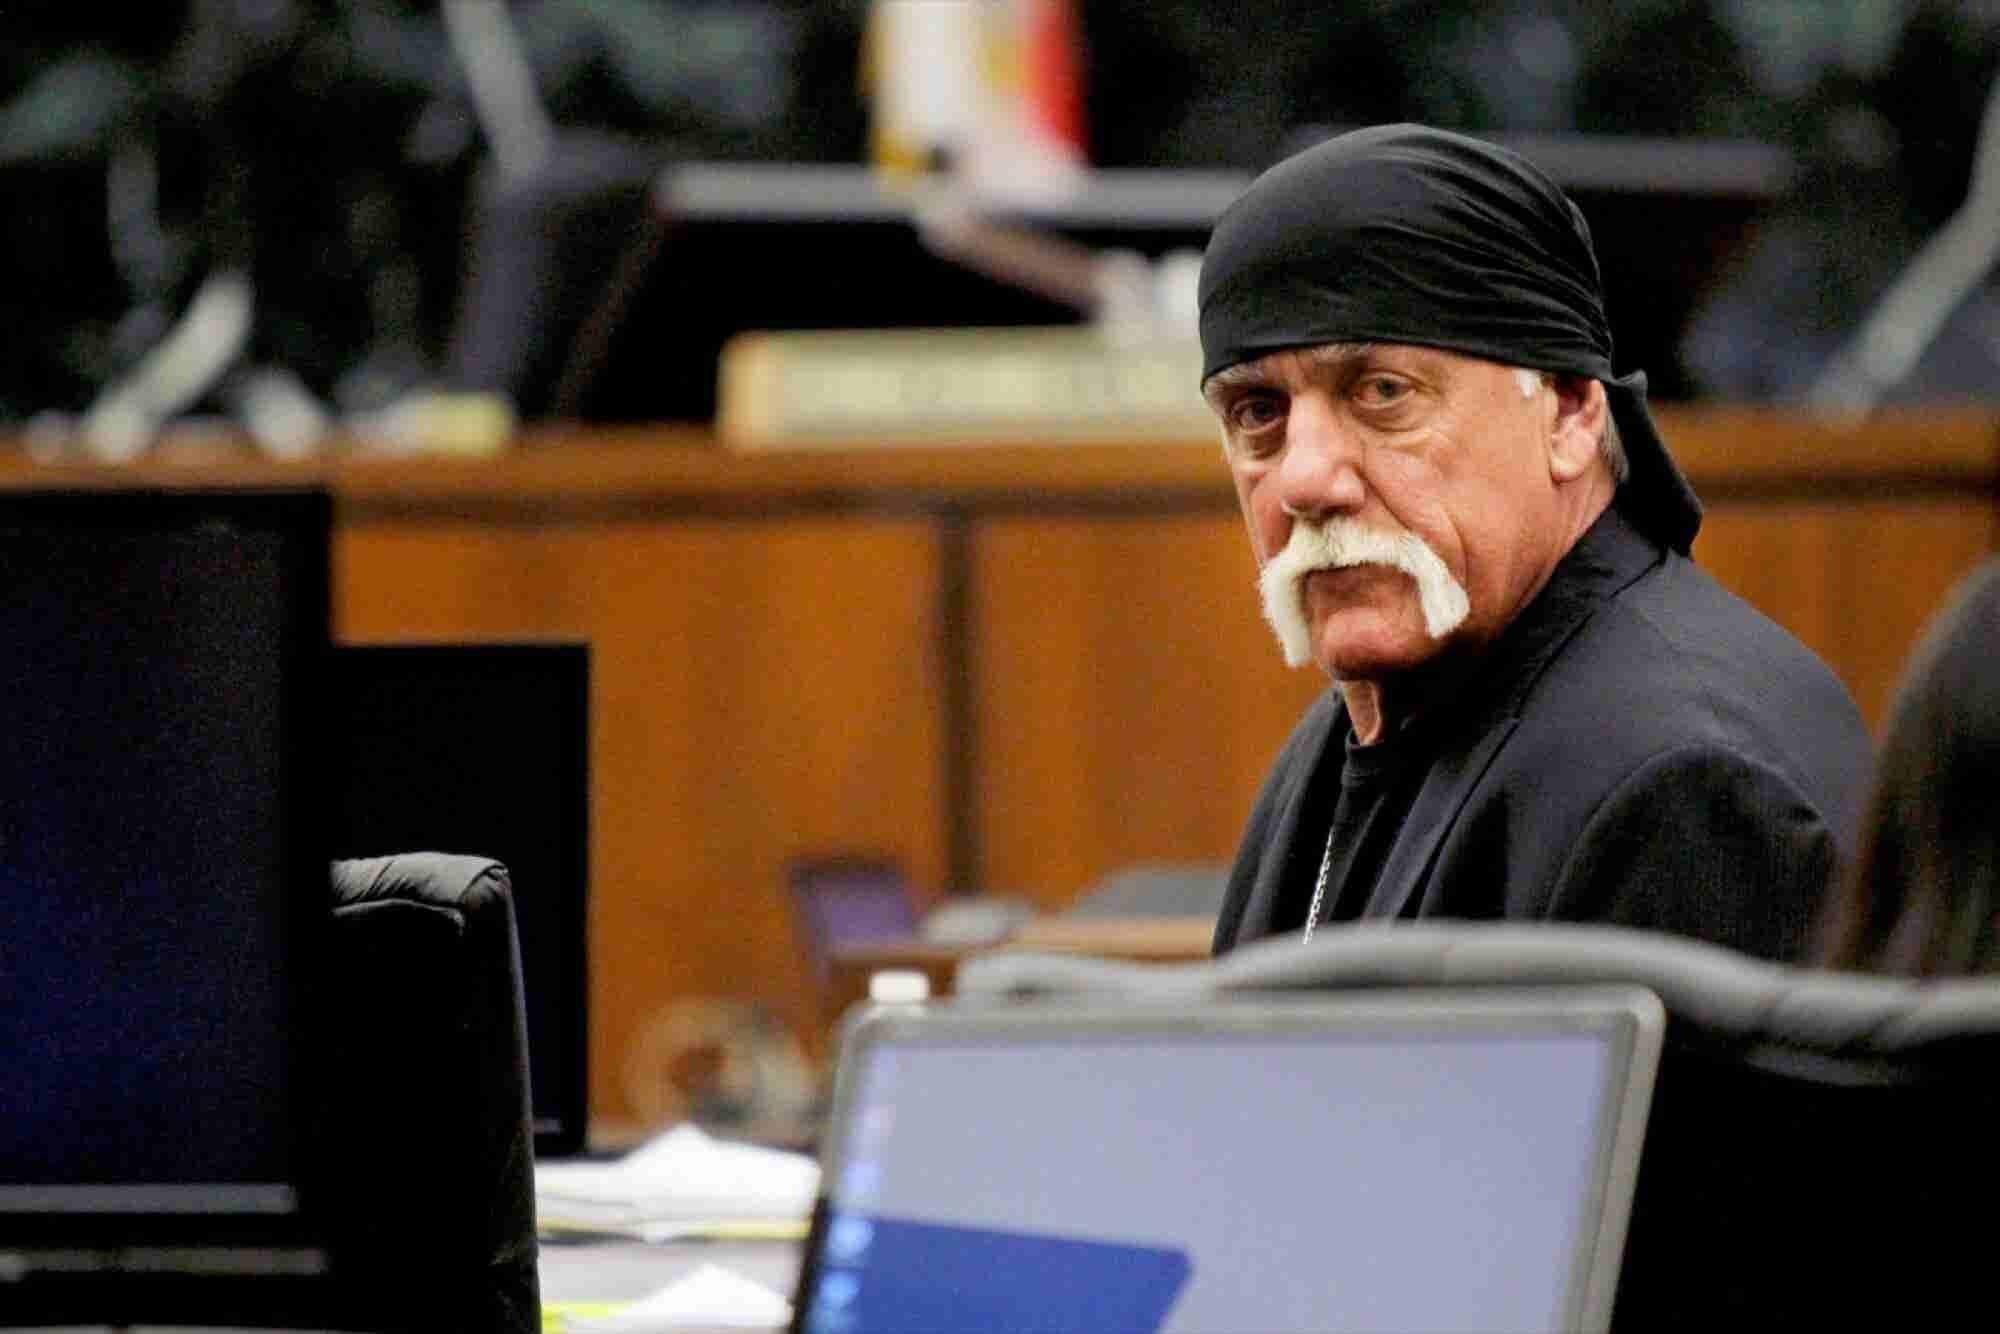 Billionaire Peter Thiel Reportedly Backed Hulk Hogan's Gawker Lawsuit